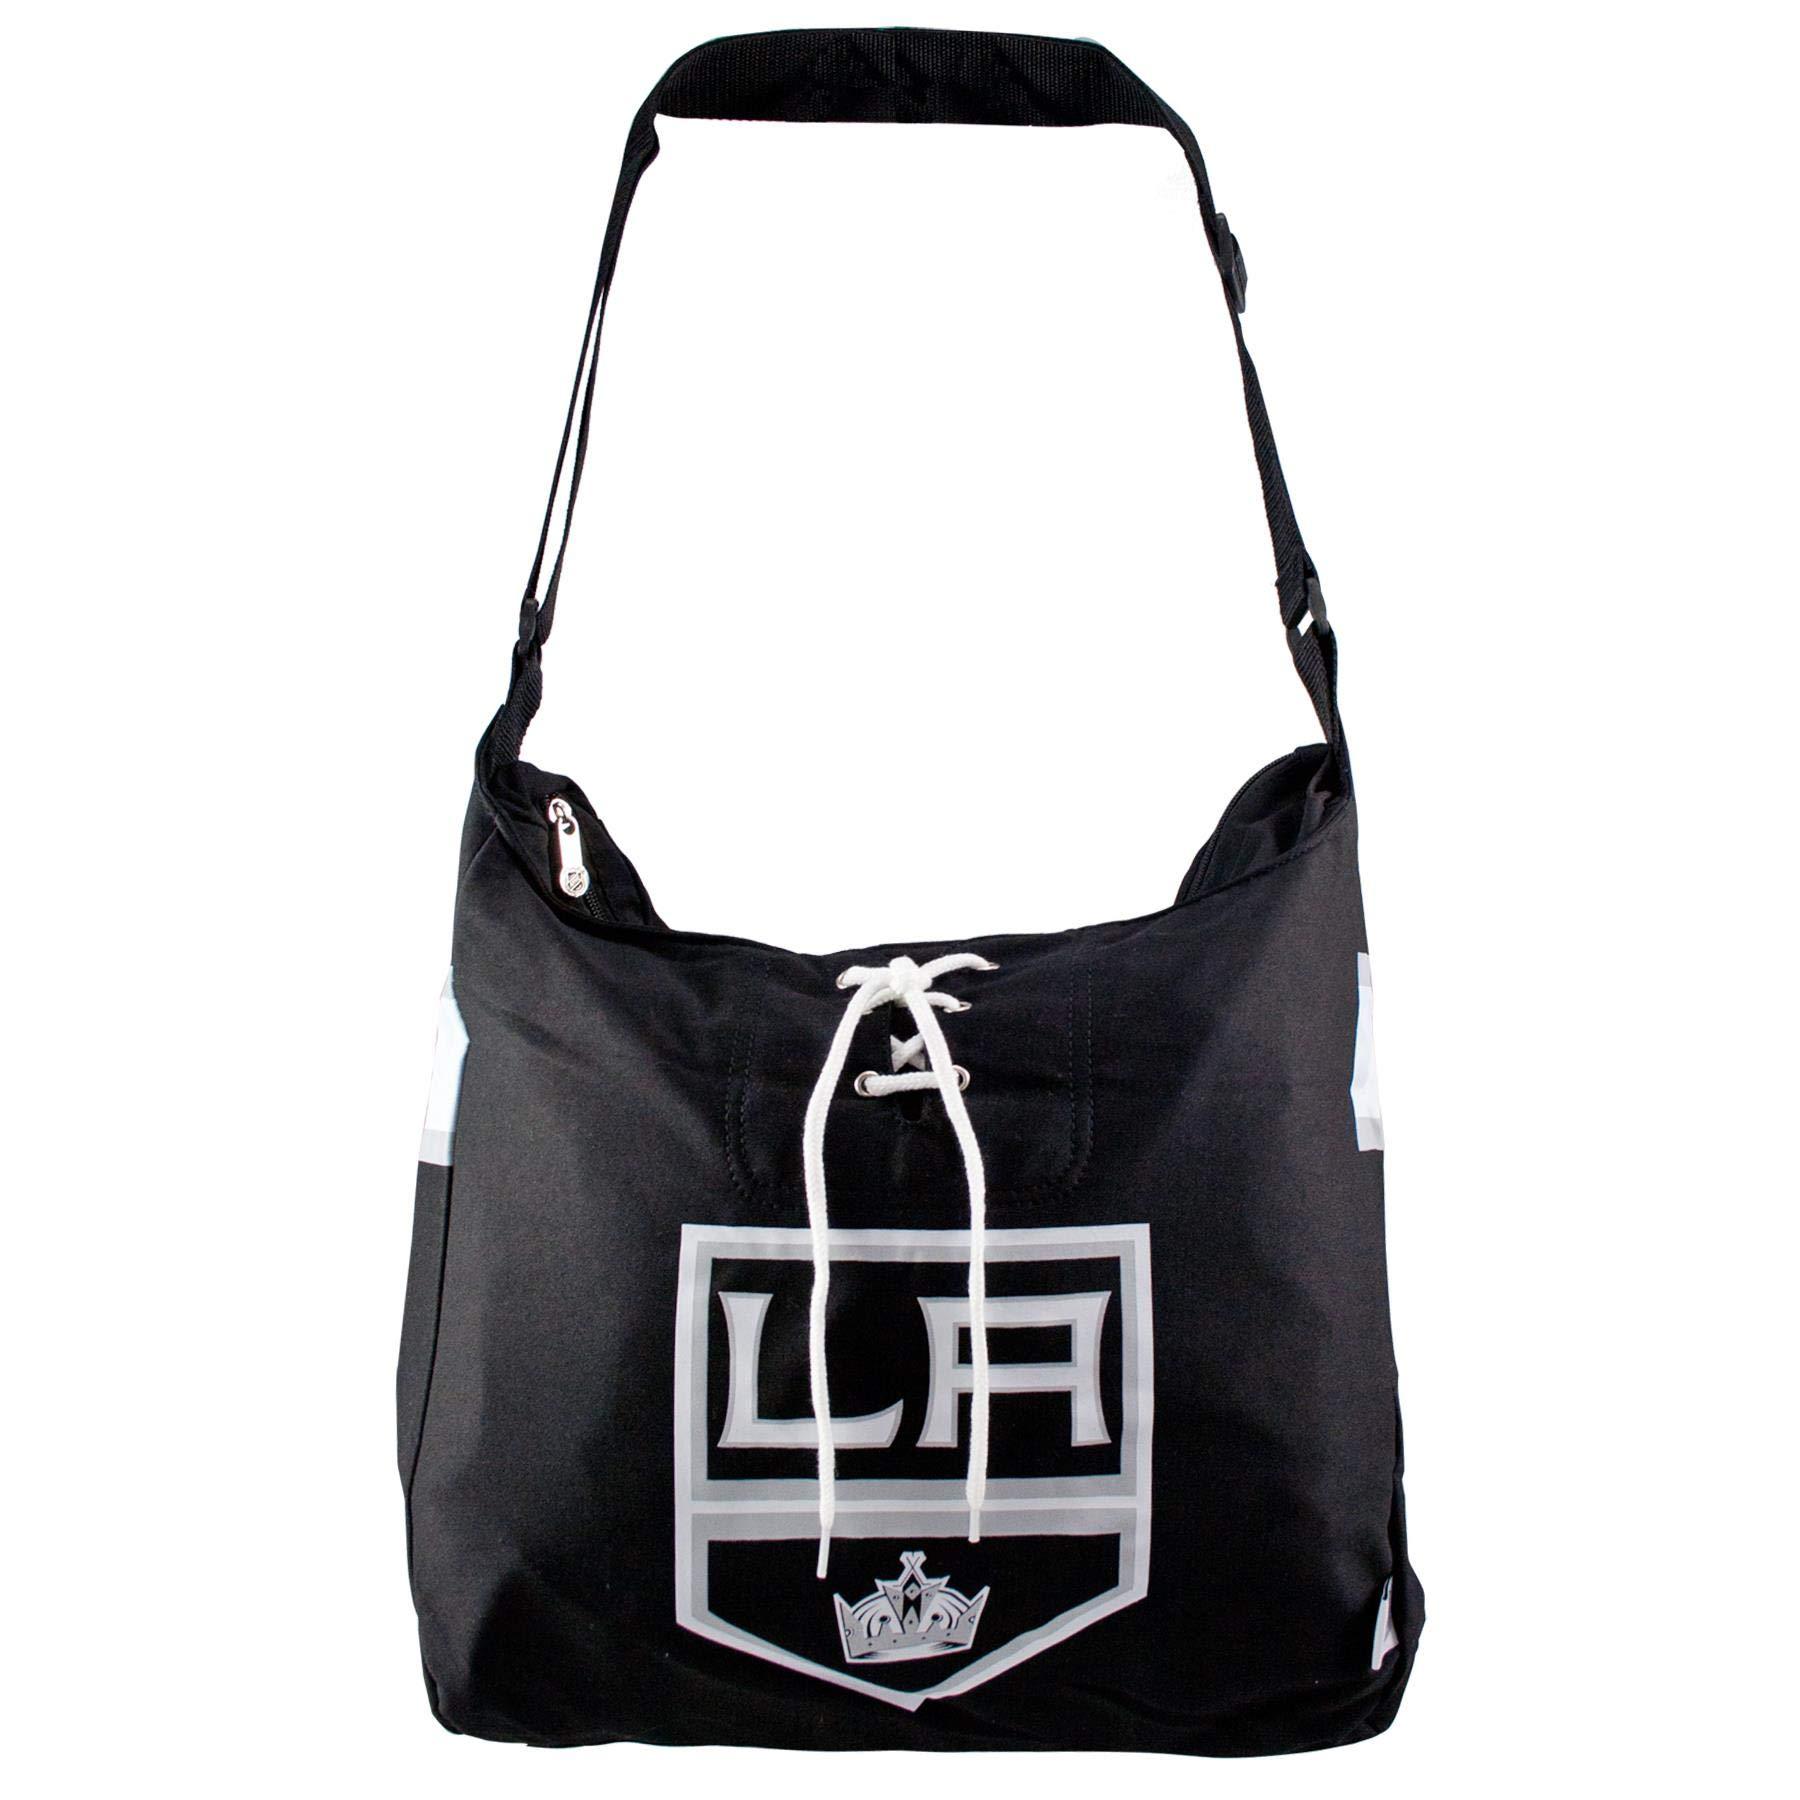 NHL Los Angeles Kings Jersey Tote